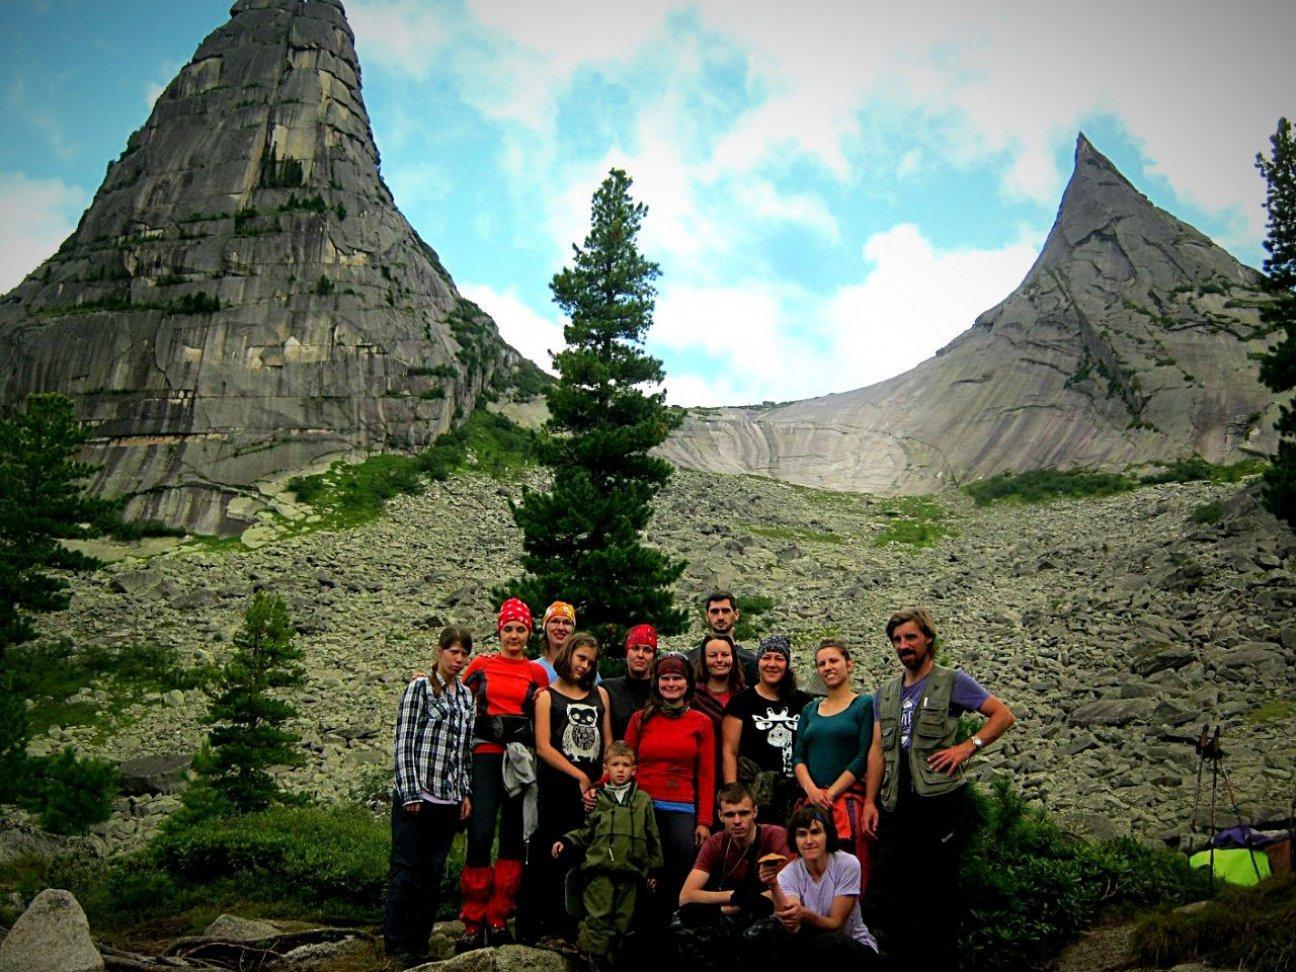 Группа туристов на фоне двух скалистых гор